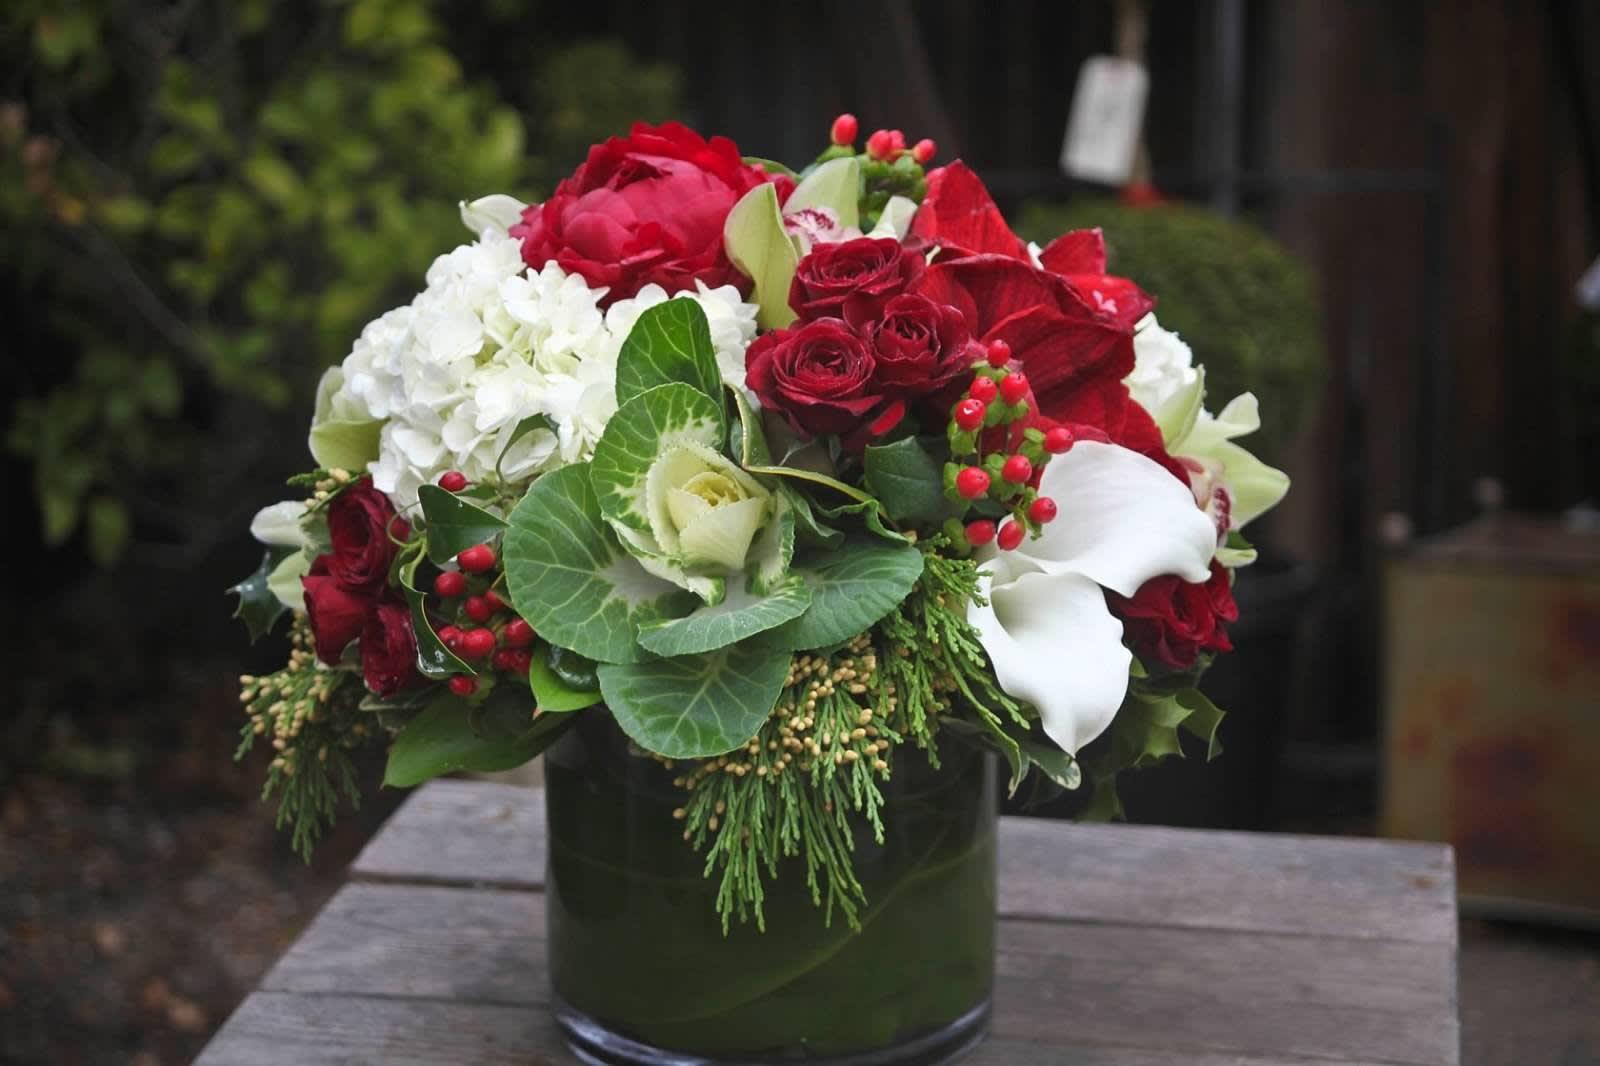 Westfield san francisco centre diy floral workshops izmirmasajfo